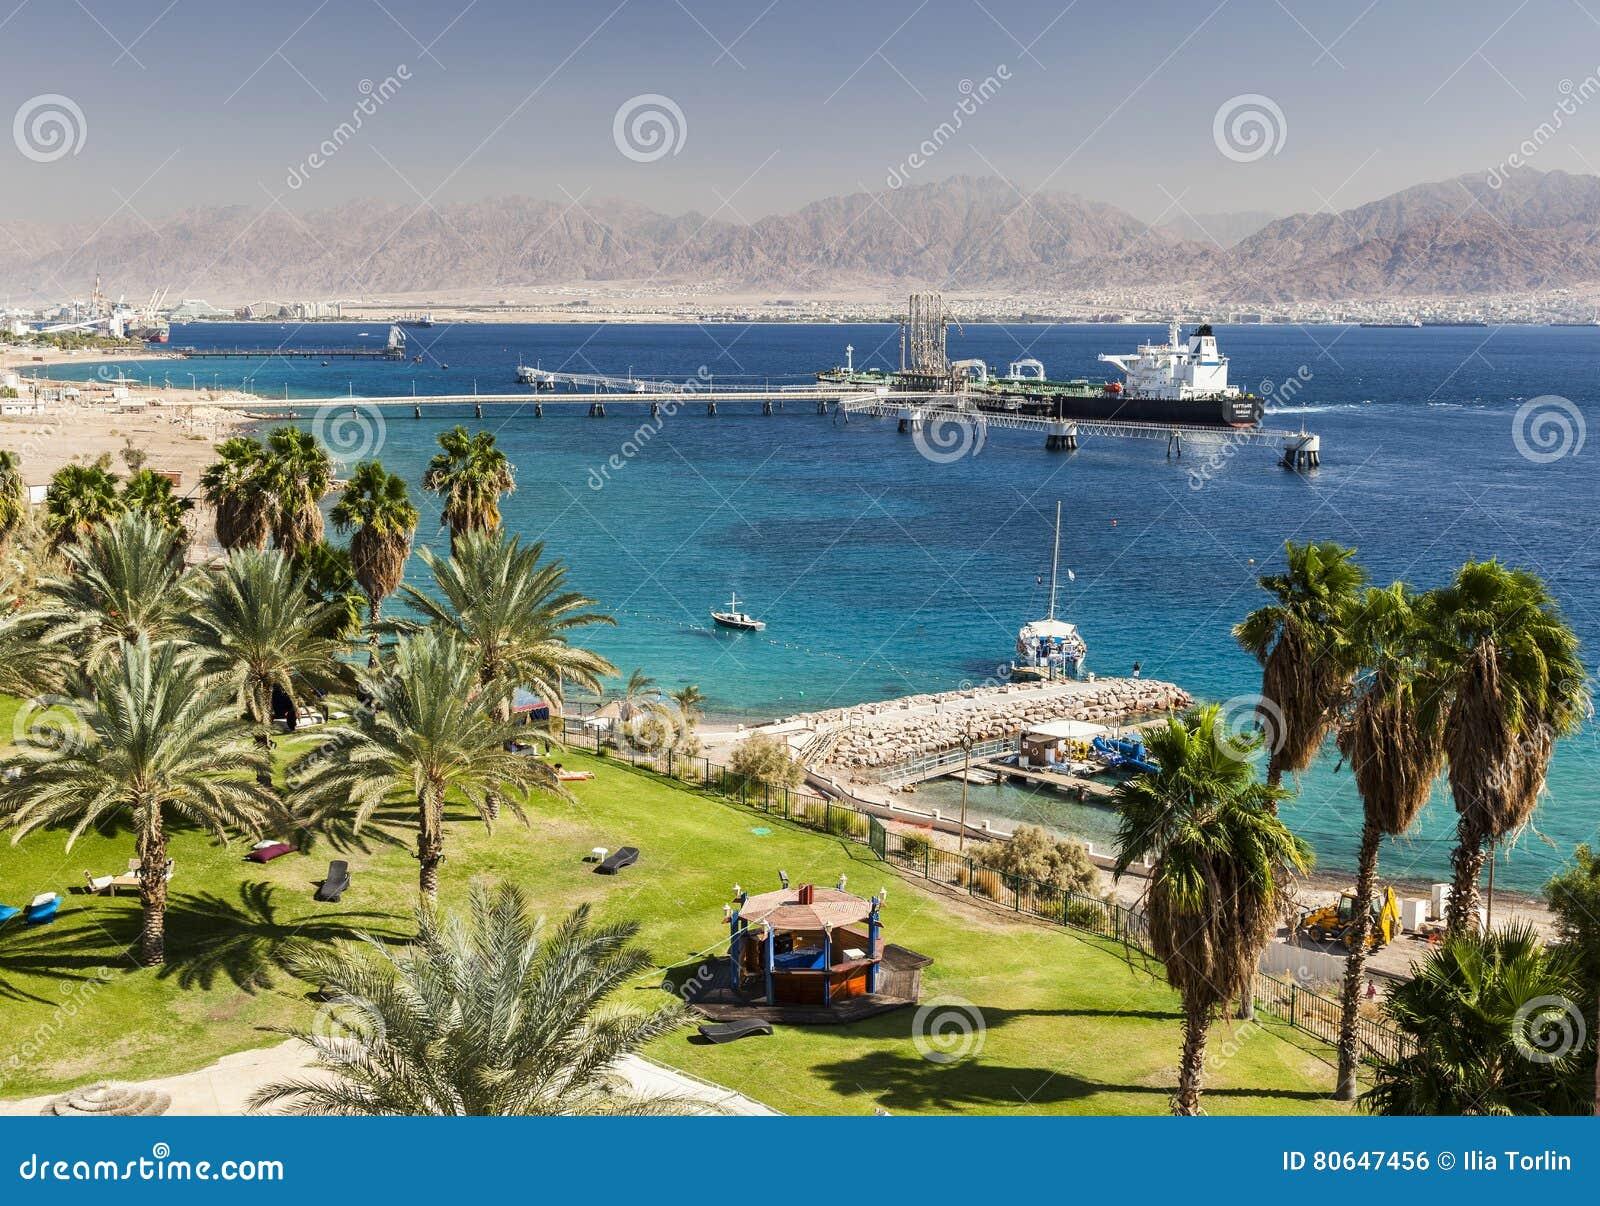 View from Eilat towards Aqaba in Jordan, Eilat. Israel.